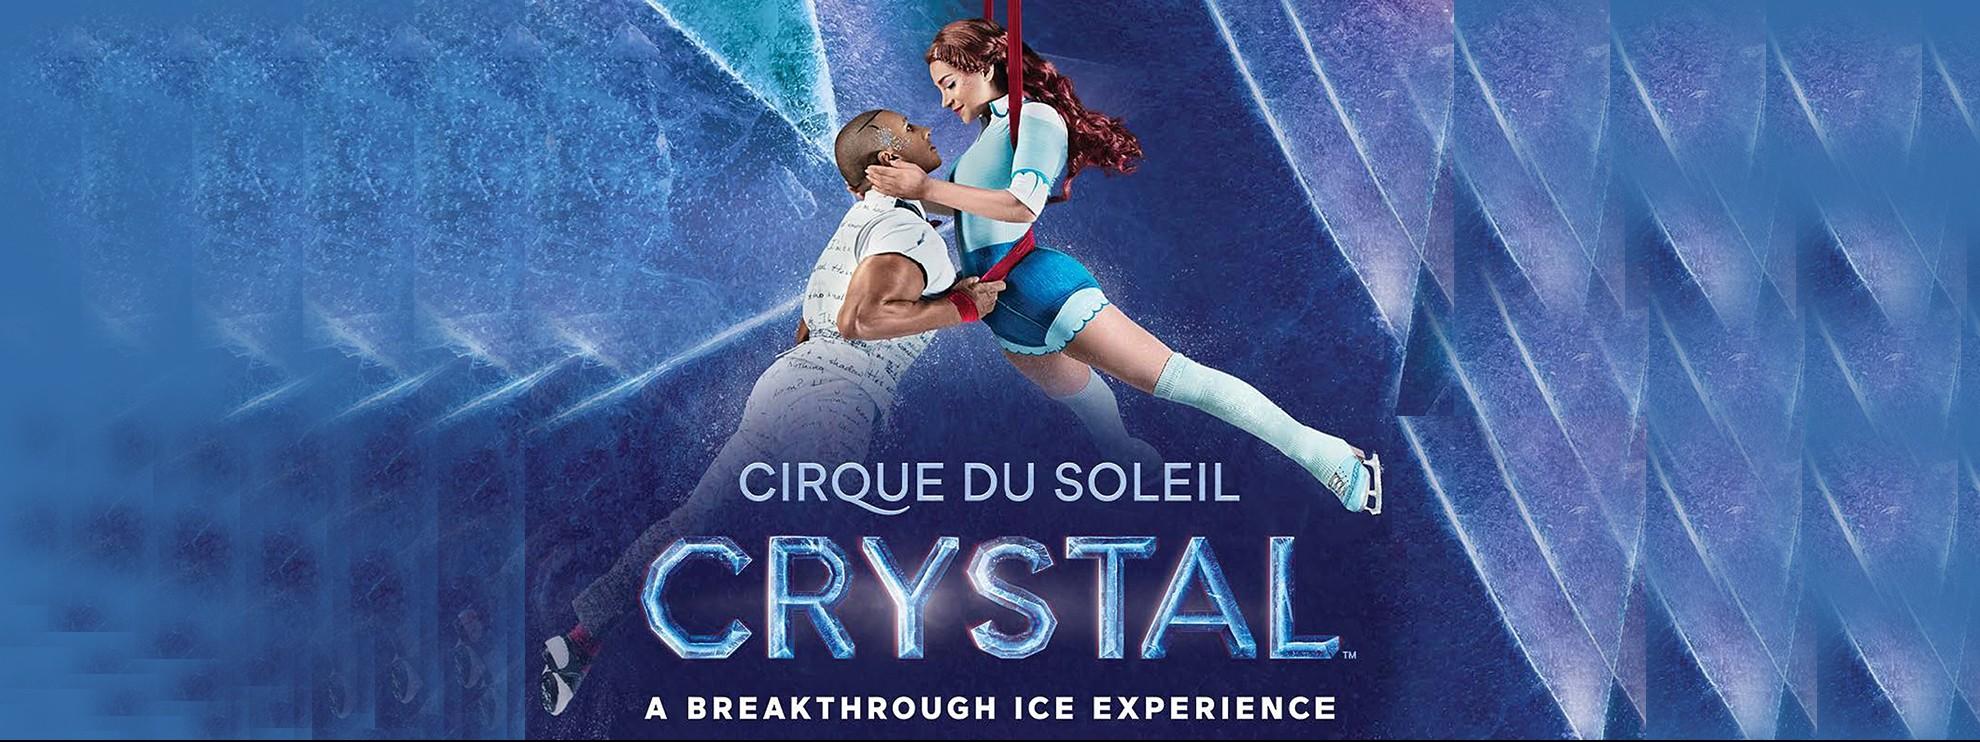 event Cirque du Soleil. Crystal